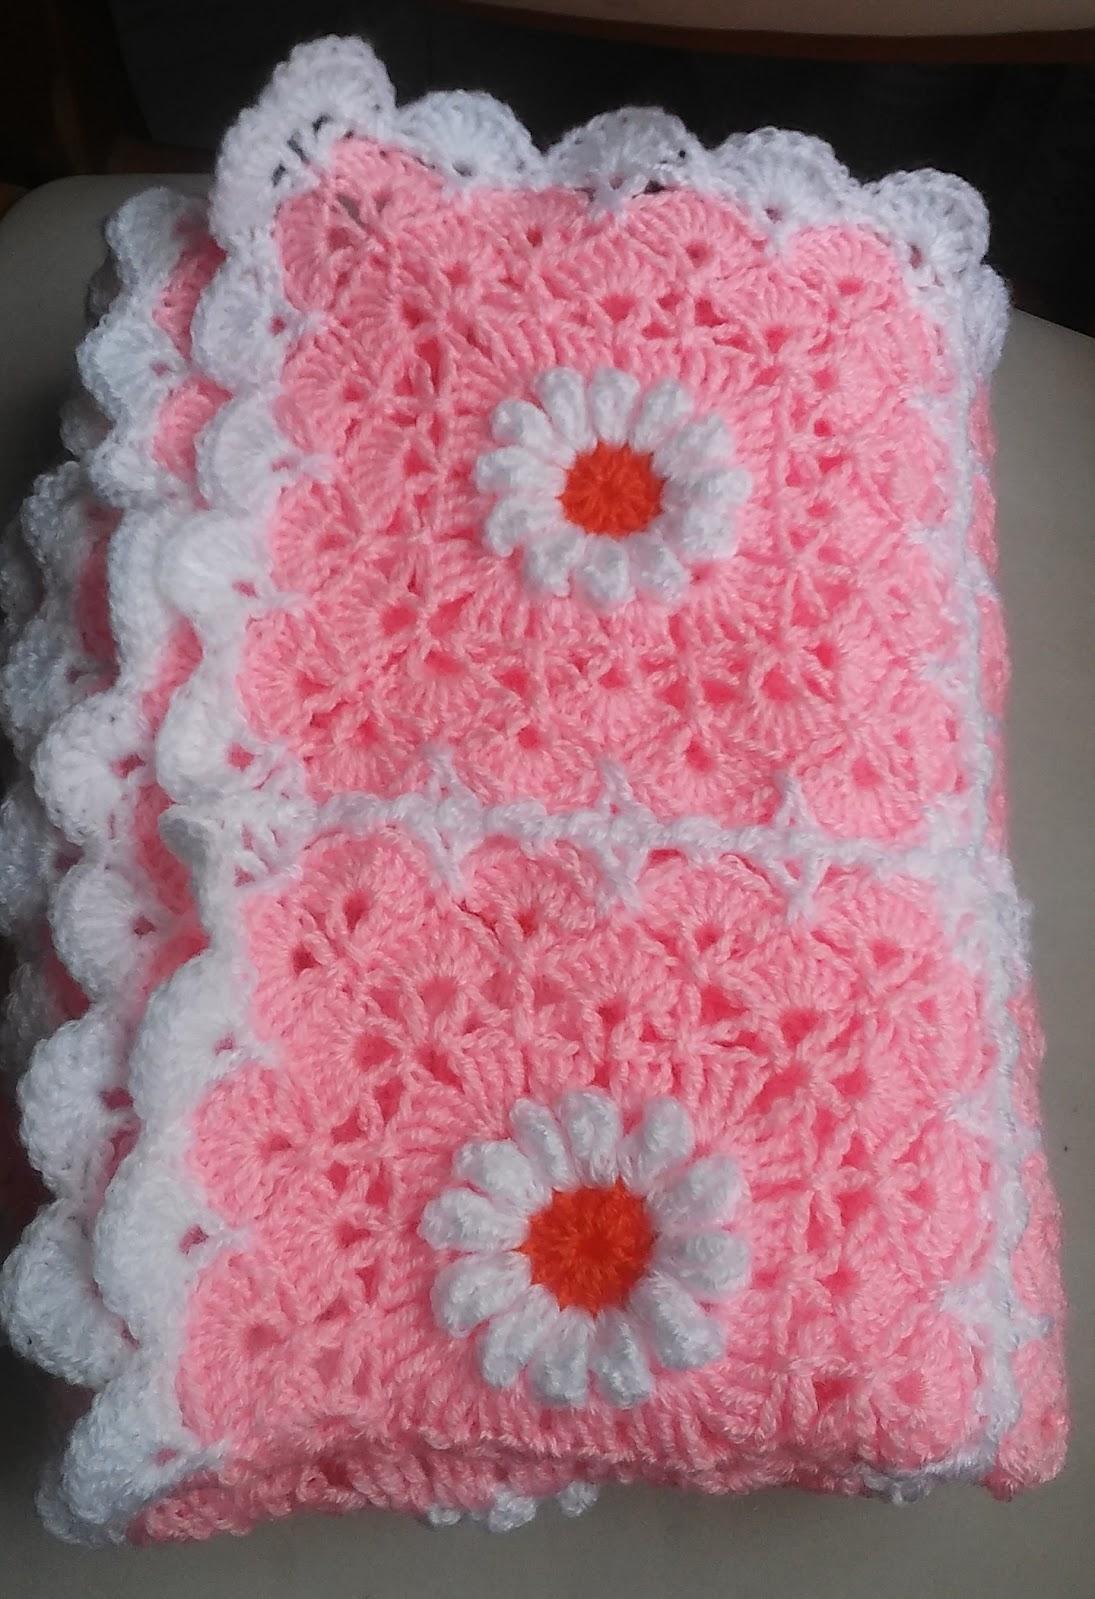 Crochet Daisy Baby Blanket Pattern : Crochet & Knitting: Pink Daisy Baby Blanket